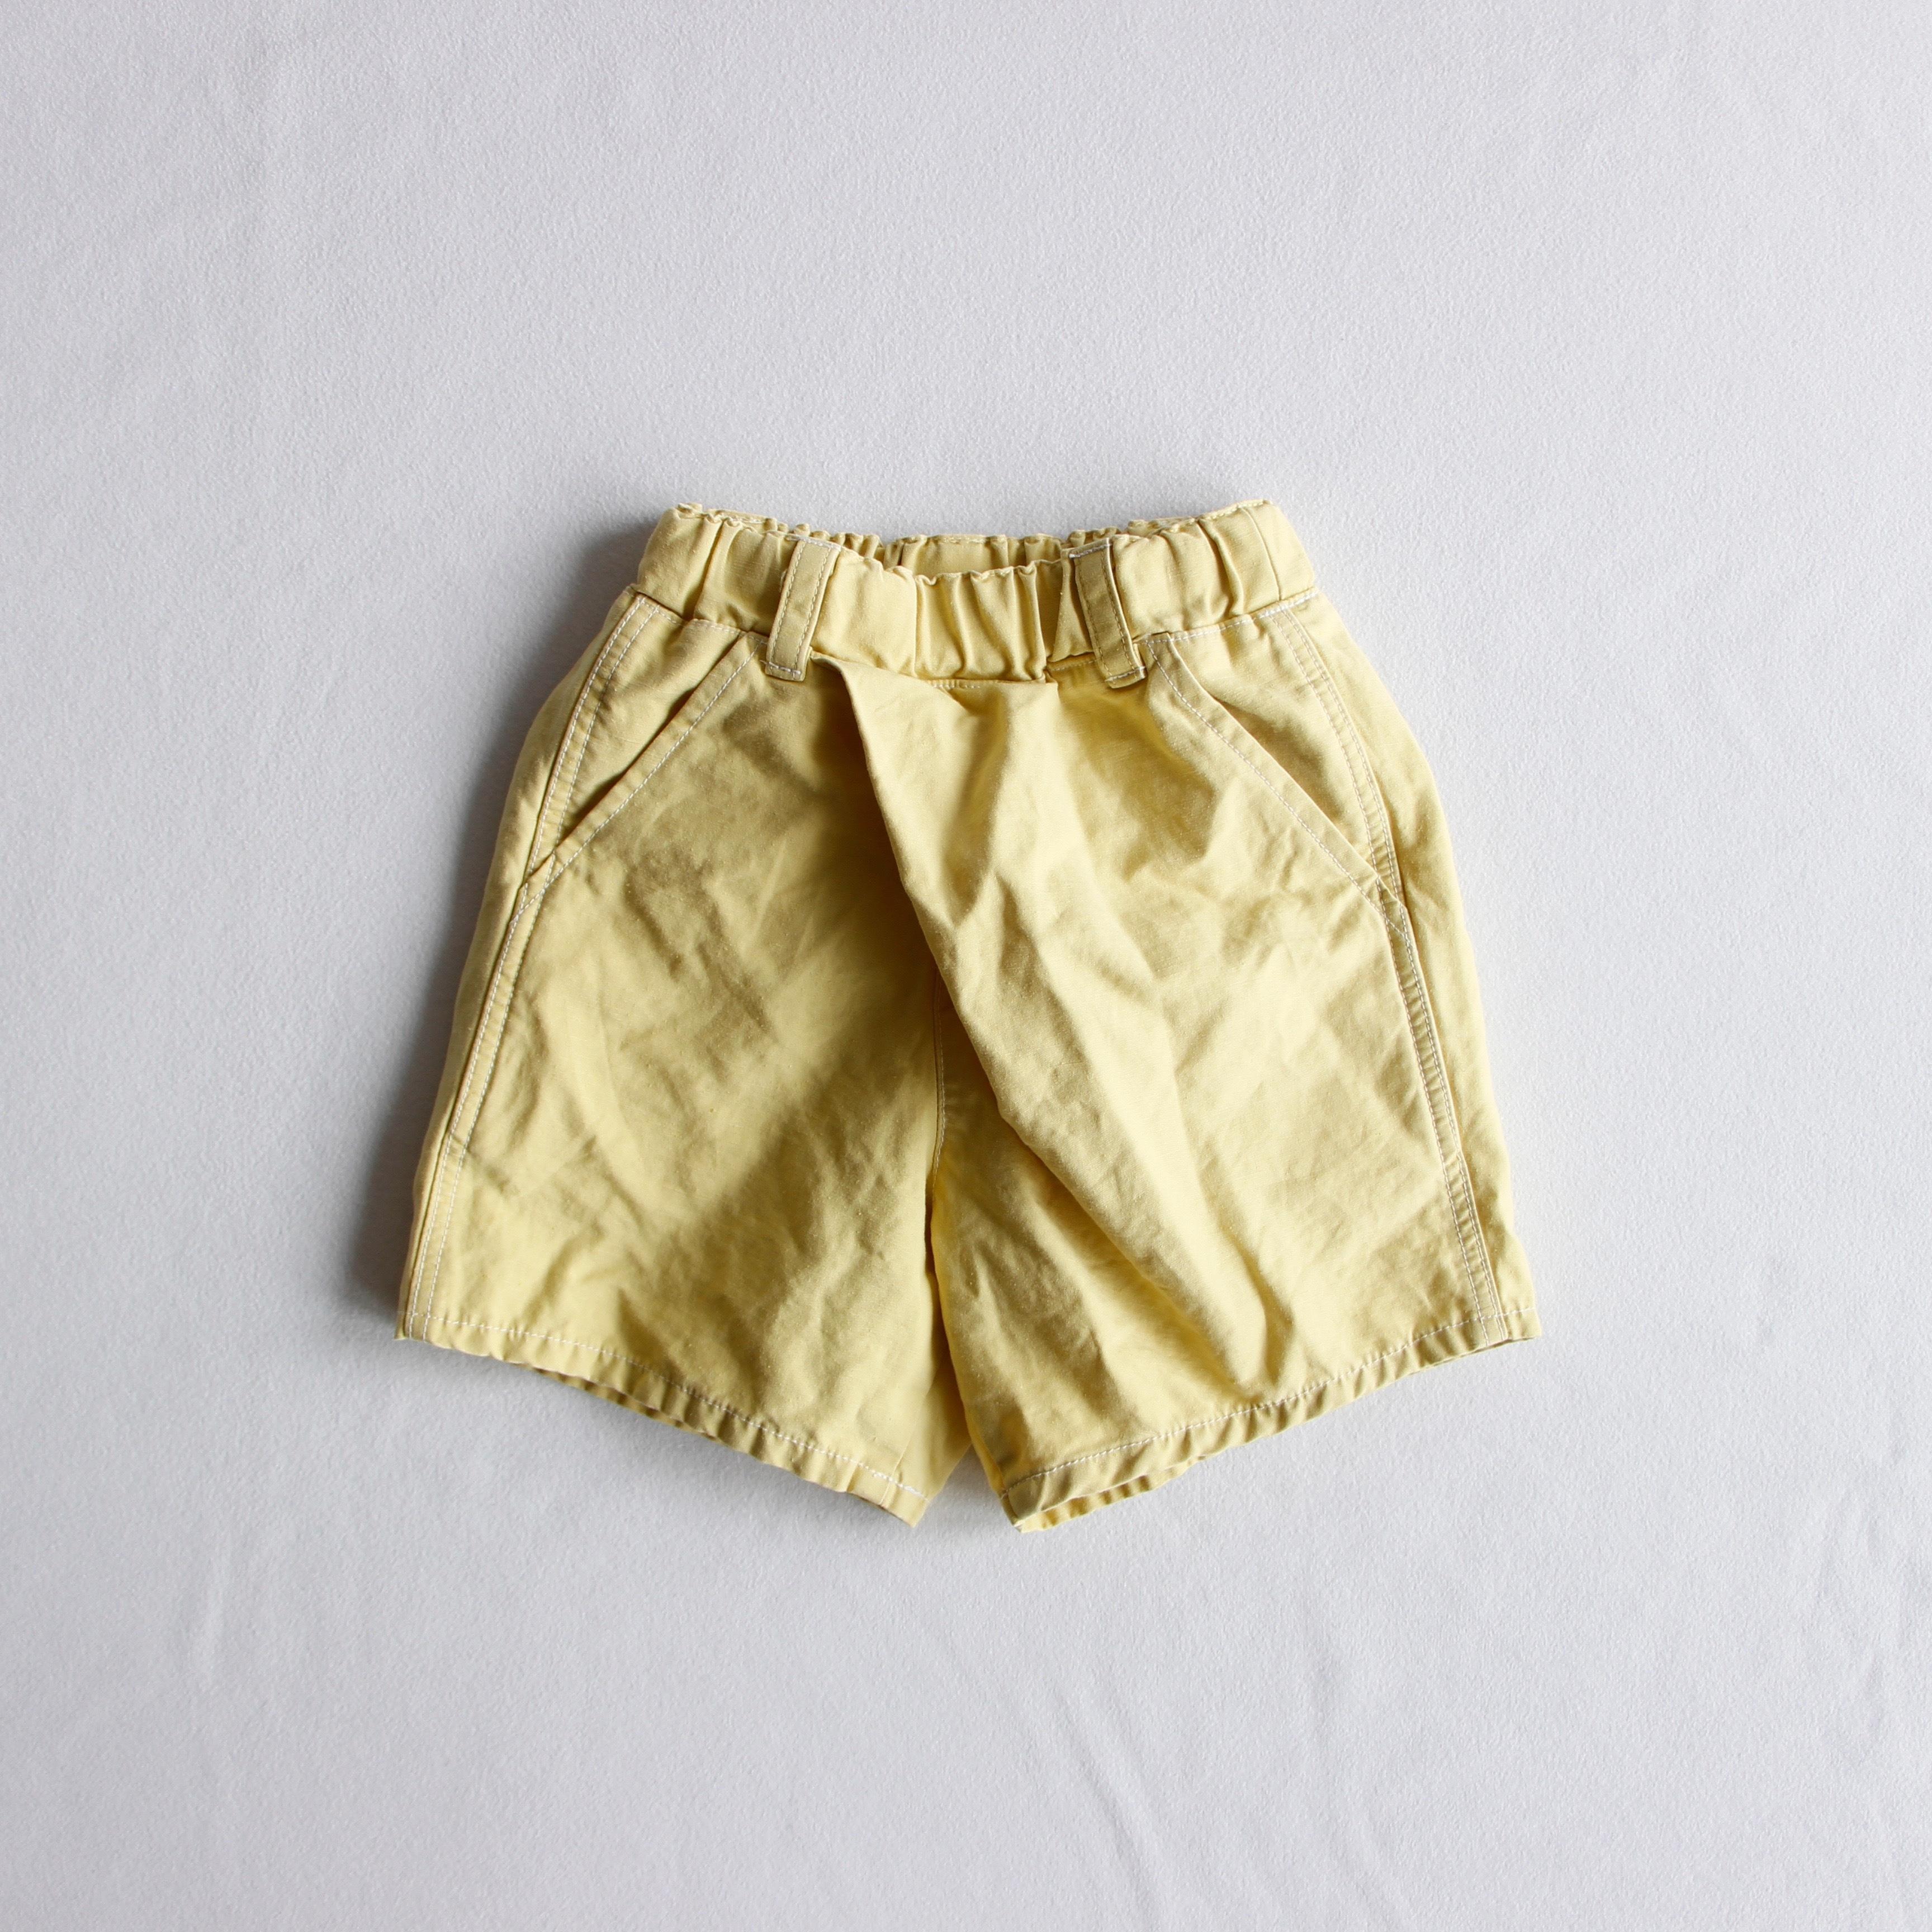 《mimi poupons 2019SS》ショートタイパンツ / yellow / 2・4・6Y